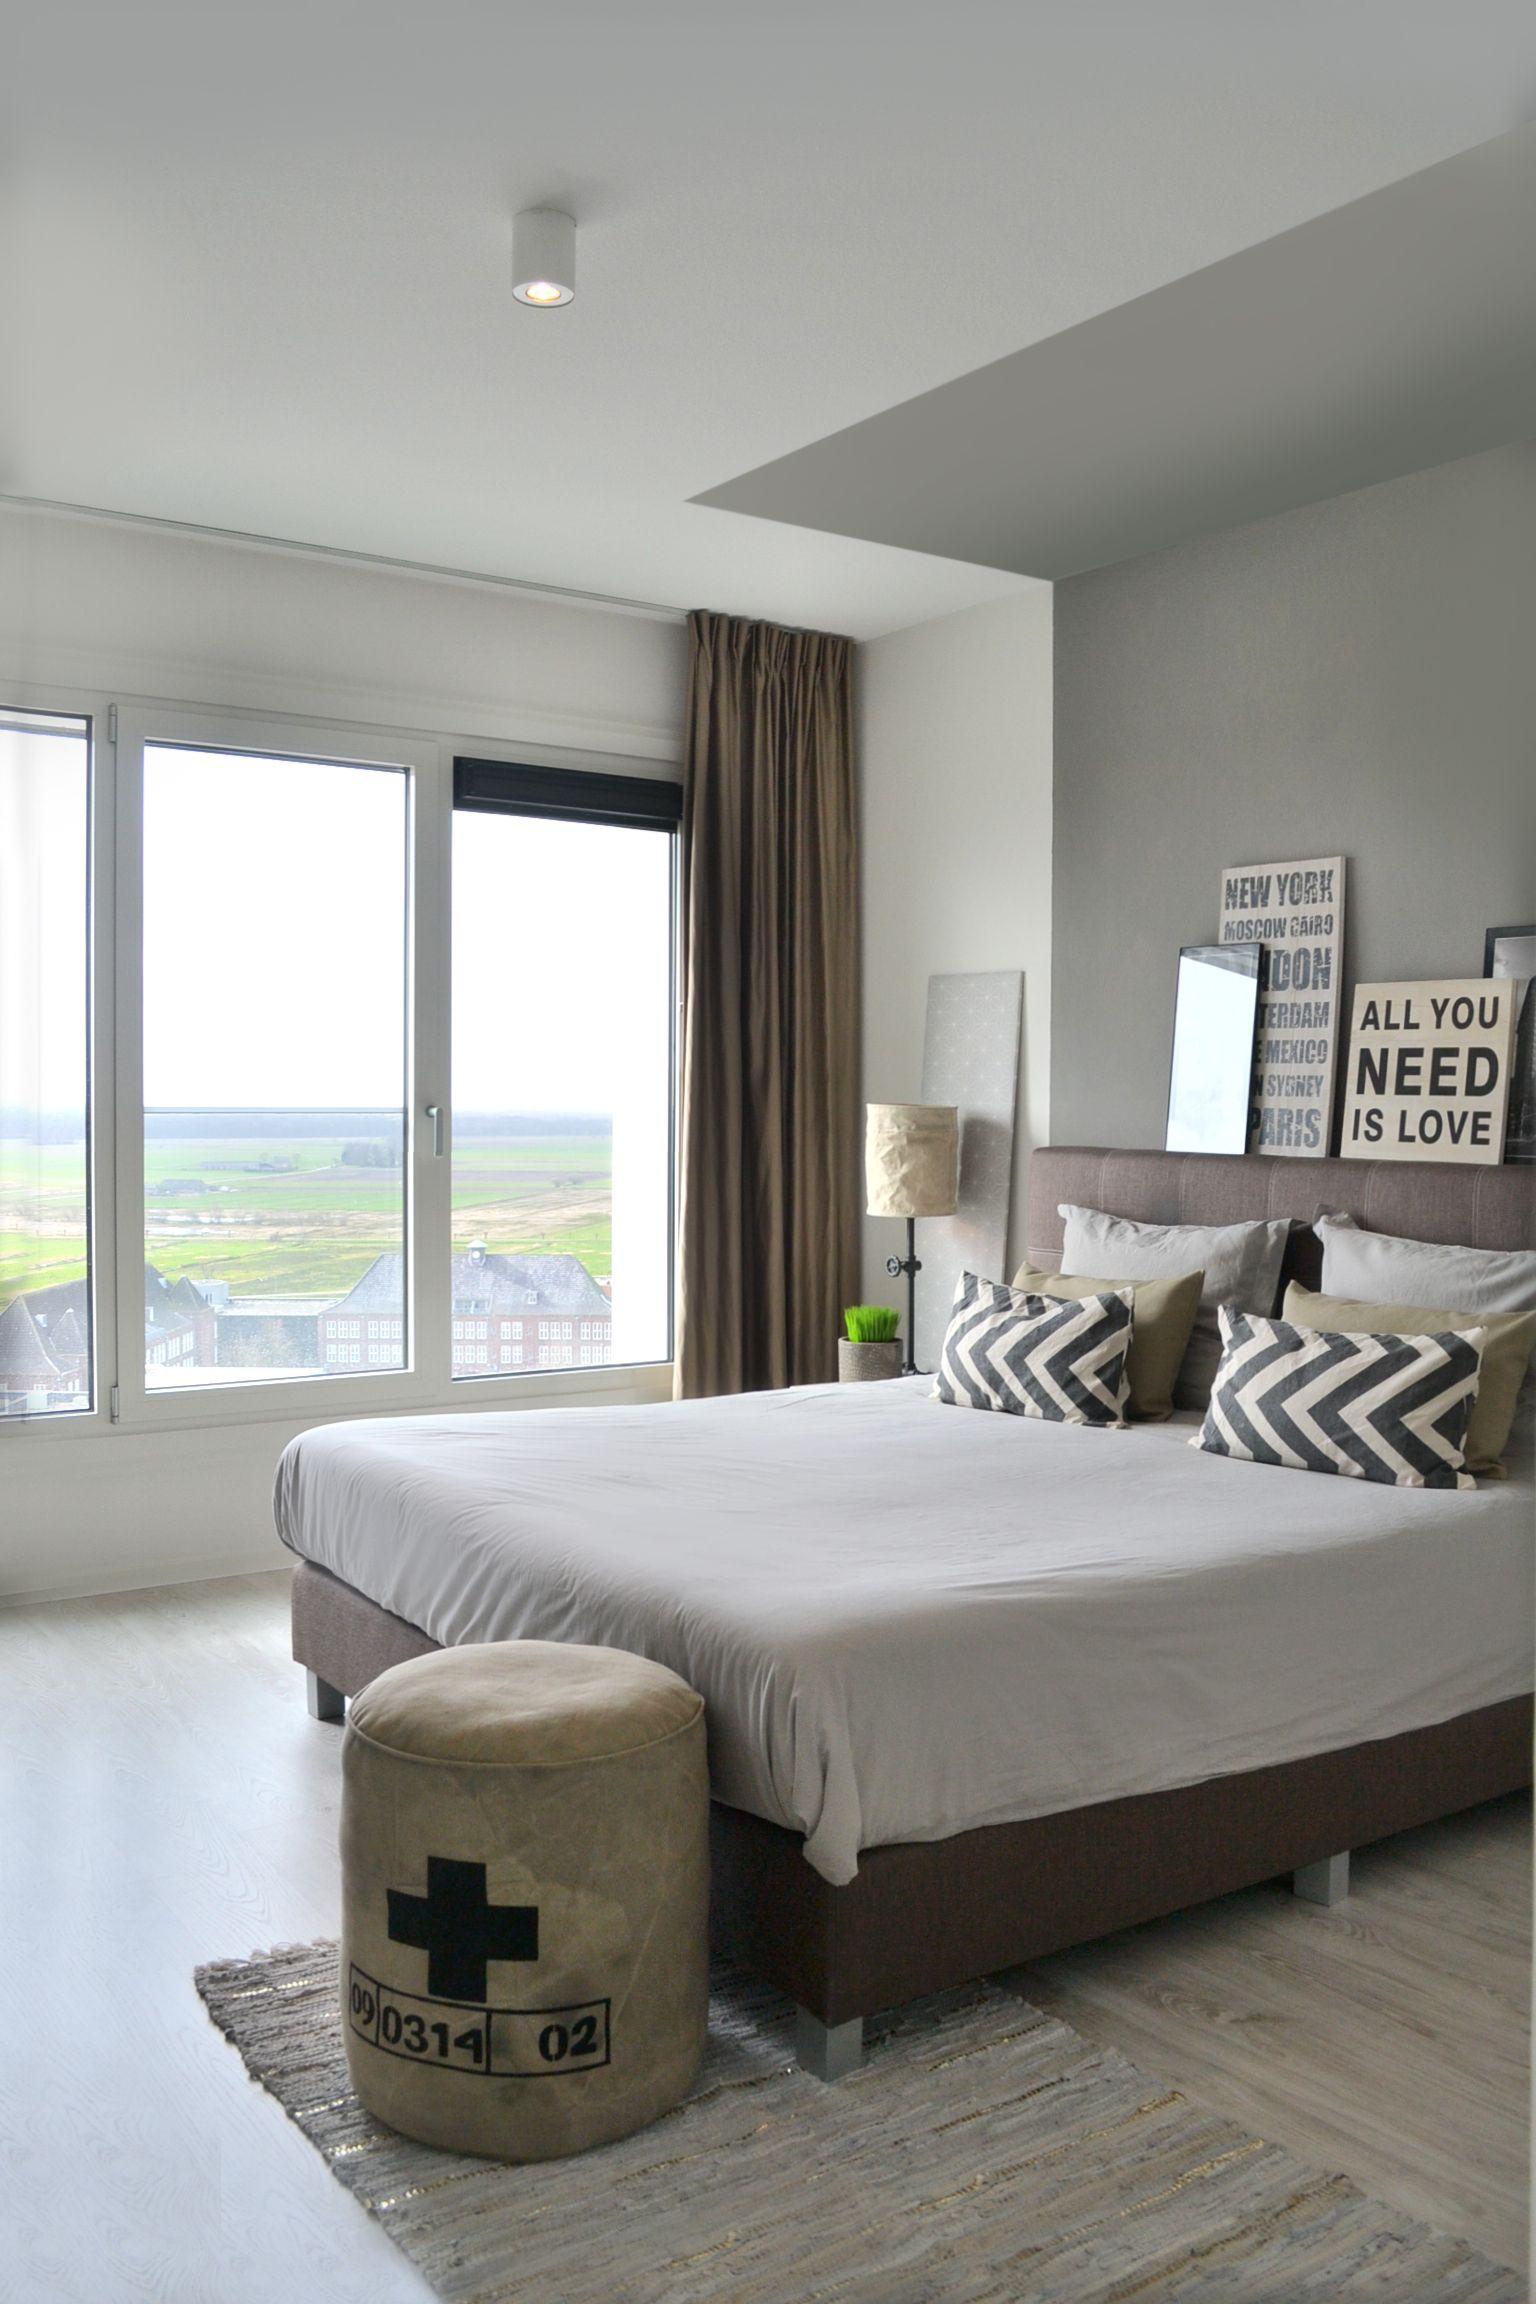 Interieur, Bedroom designs and Interior design on Pinterest